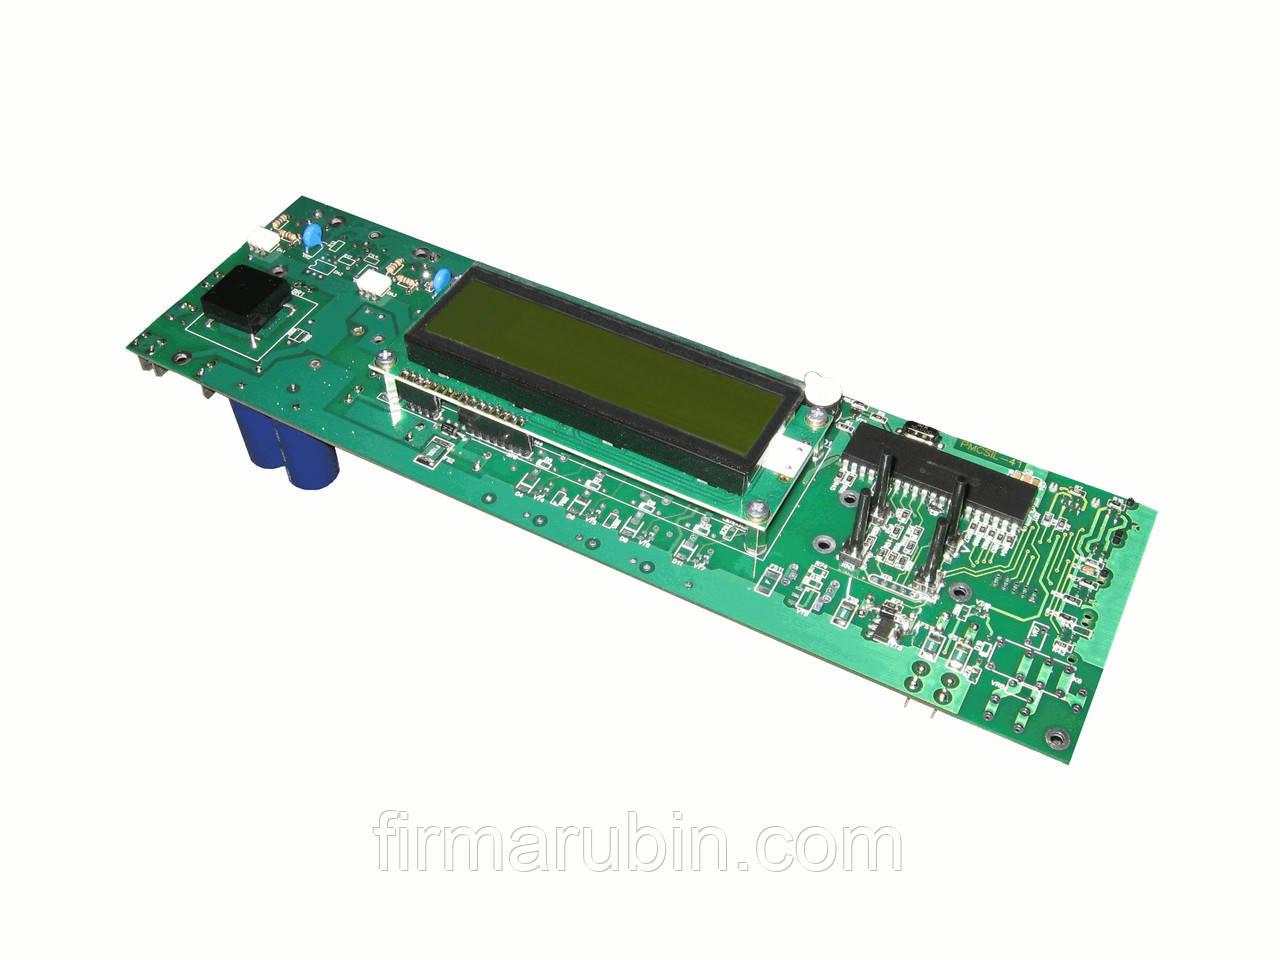 STRAUS-S13-200K — комплект контроллера инкубатора до 1200 яиц с датчиками